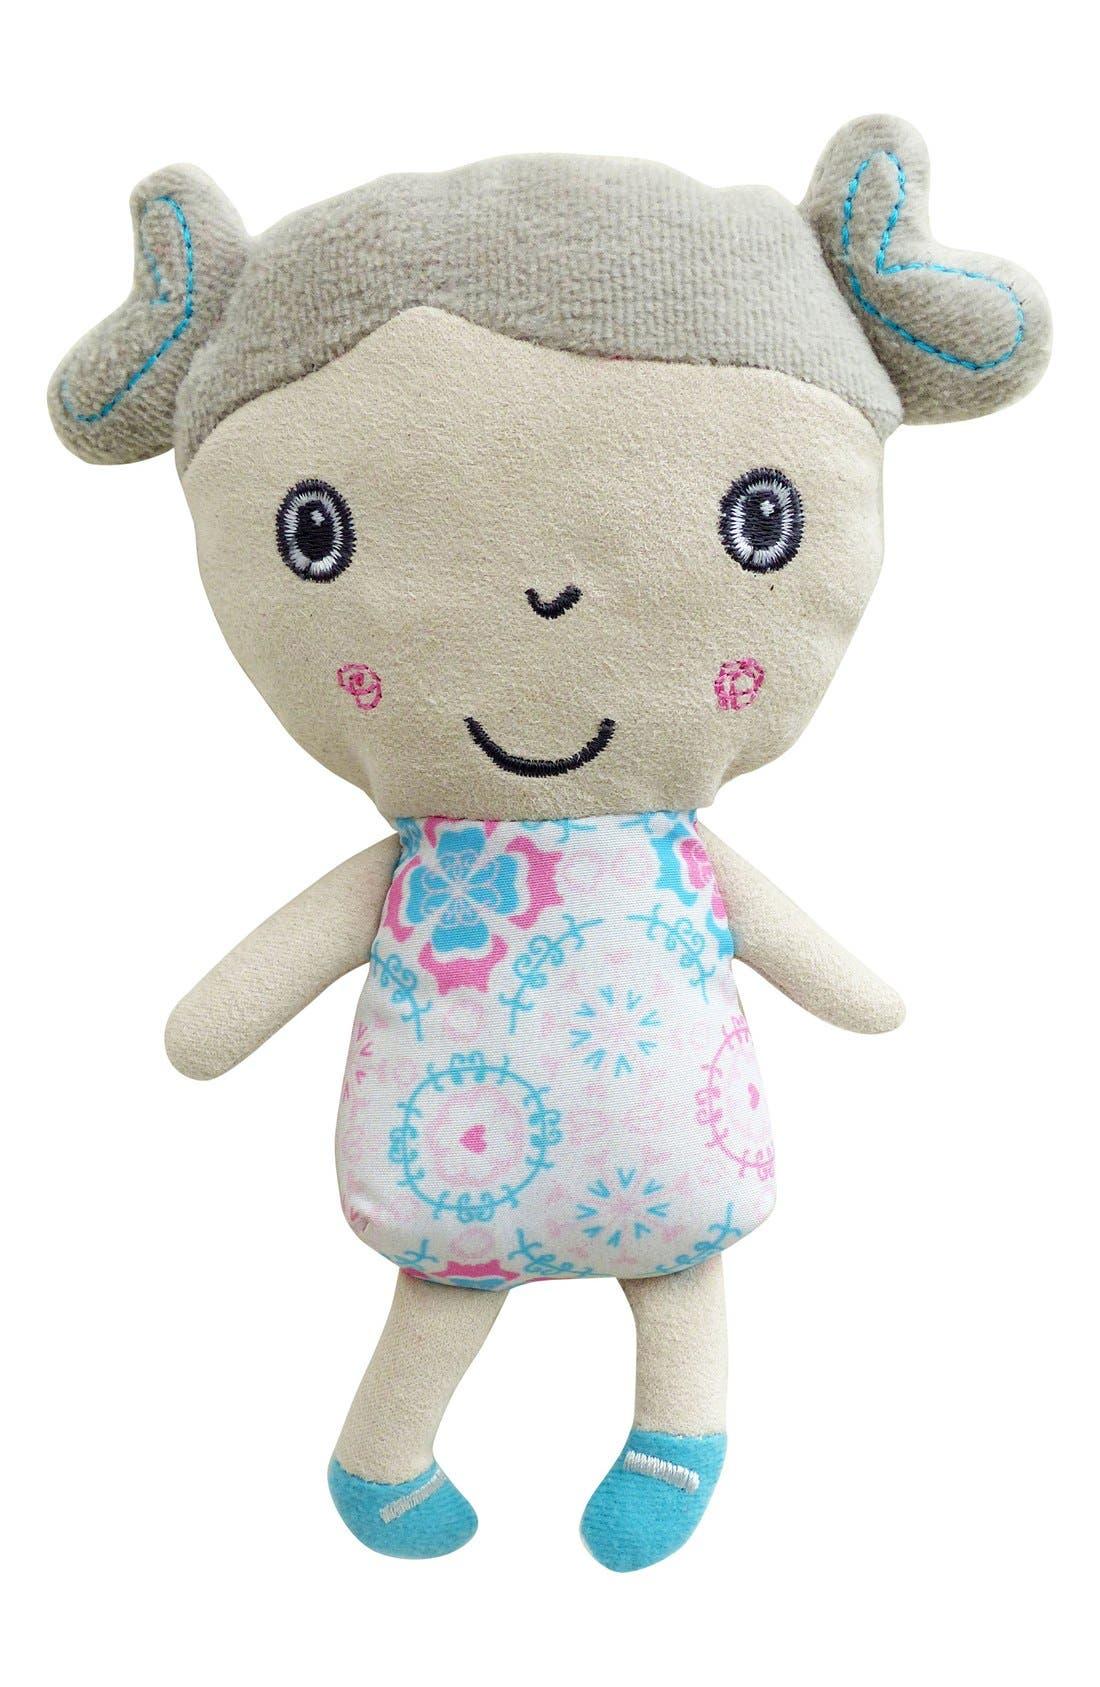 Rosie & Mae Rocking Horse & Stuffed Animal,                             Alternate thumbnail 3, color,                             Pink